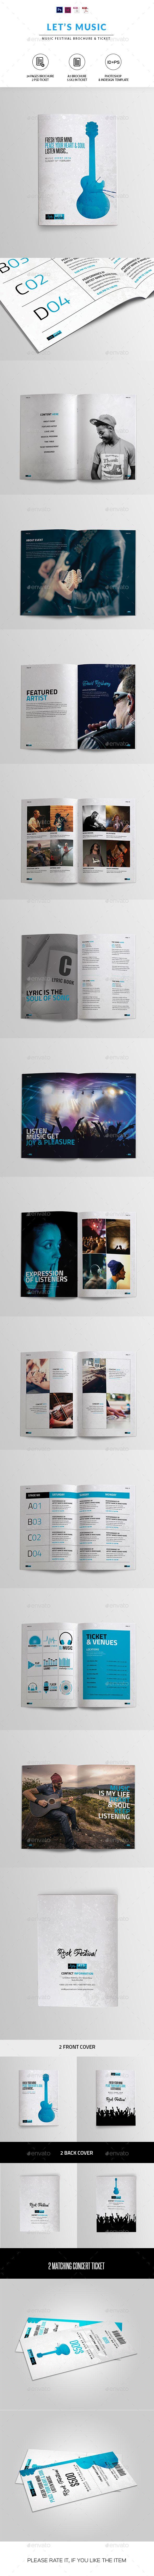 Music Festival Brochure   Indesign & Photoshop Template   Brochures ...